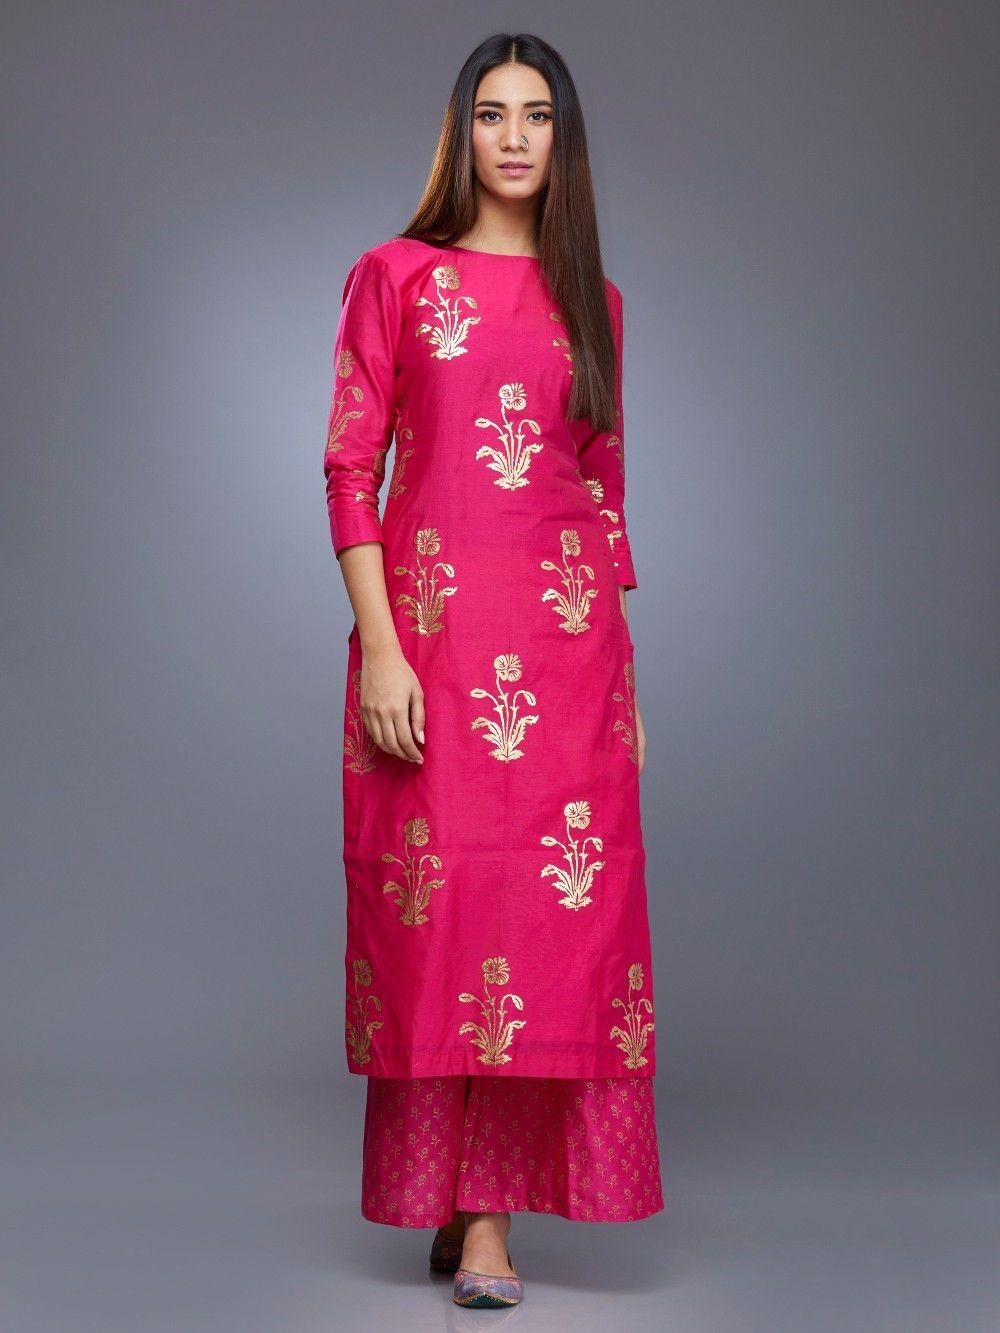 15ccaa0271 Pink Chanderi Gulmohar Block Printed Kurta in 2019 | Anarkali ...